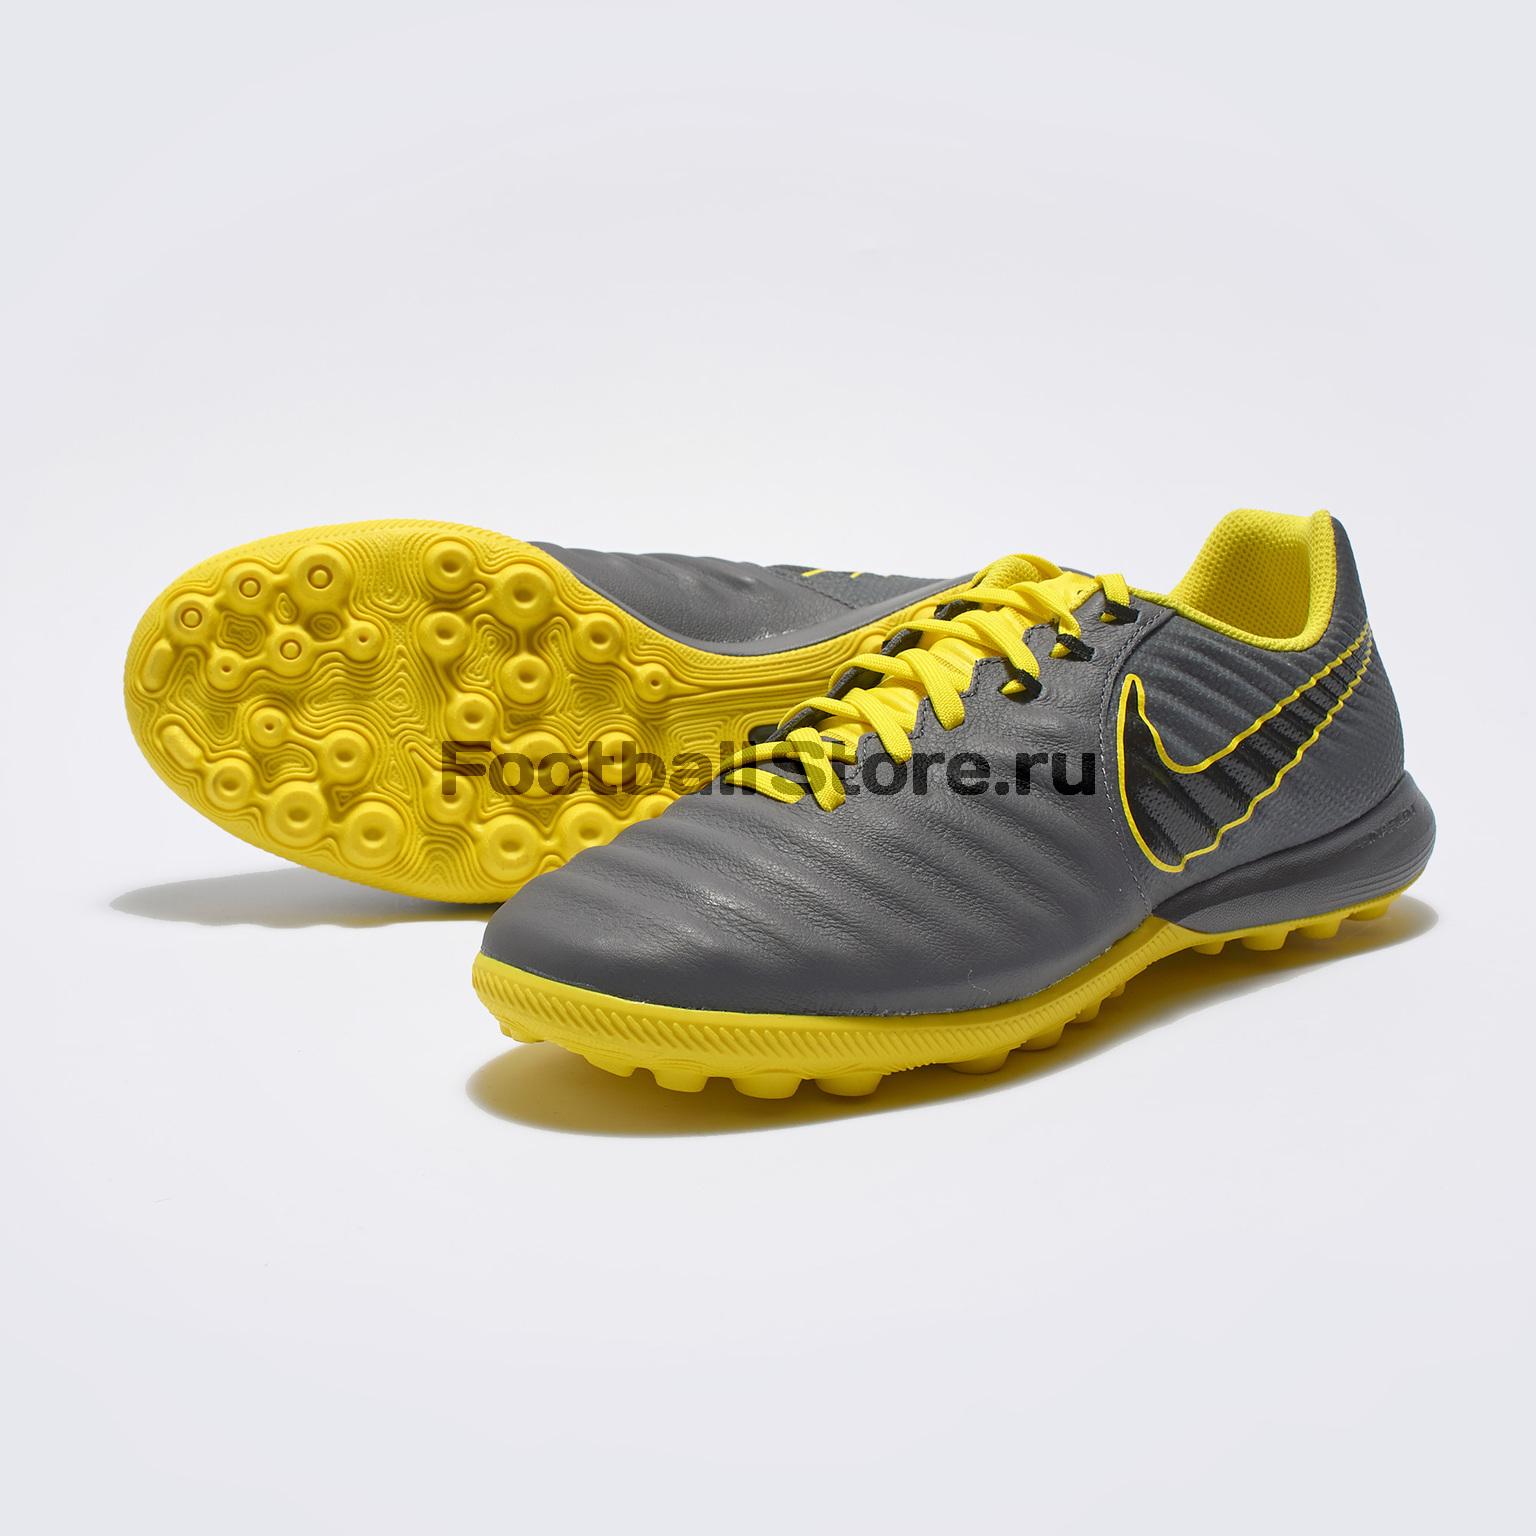 Шиповки Nike Lunar Legend 7 Pro TF AH7249-070